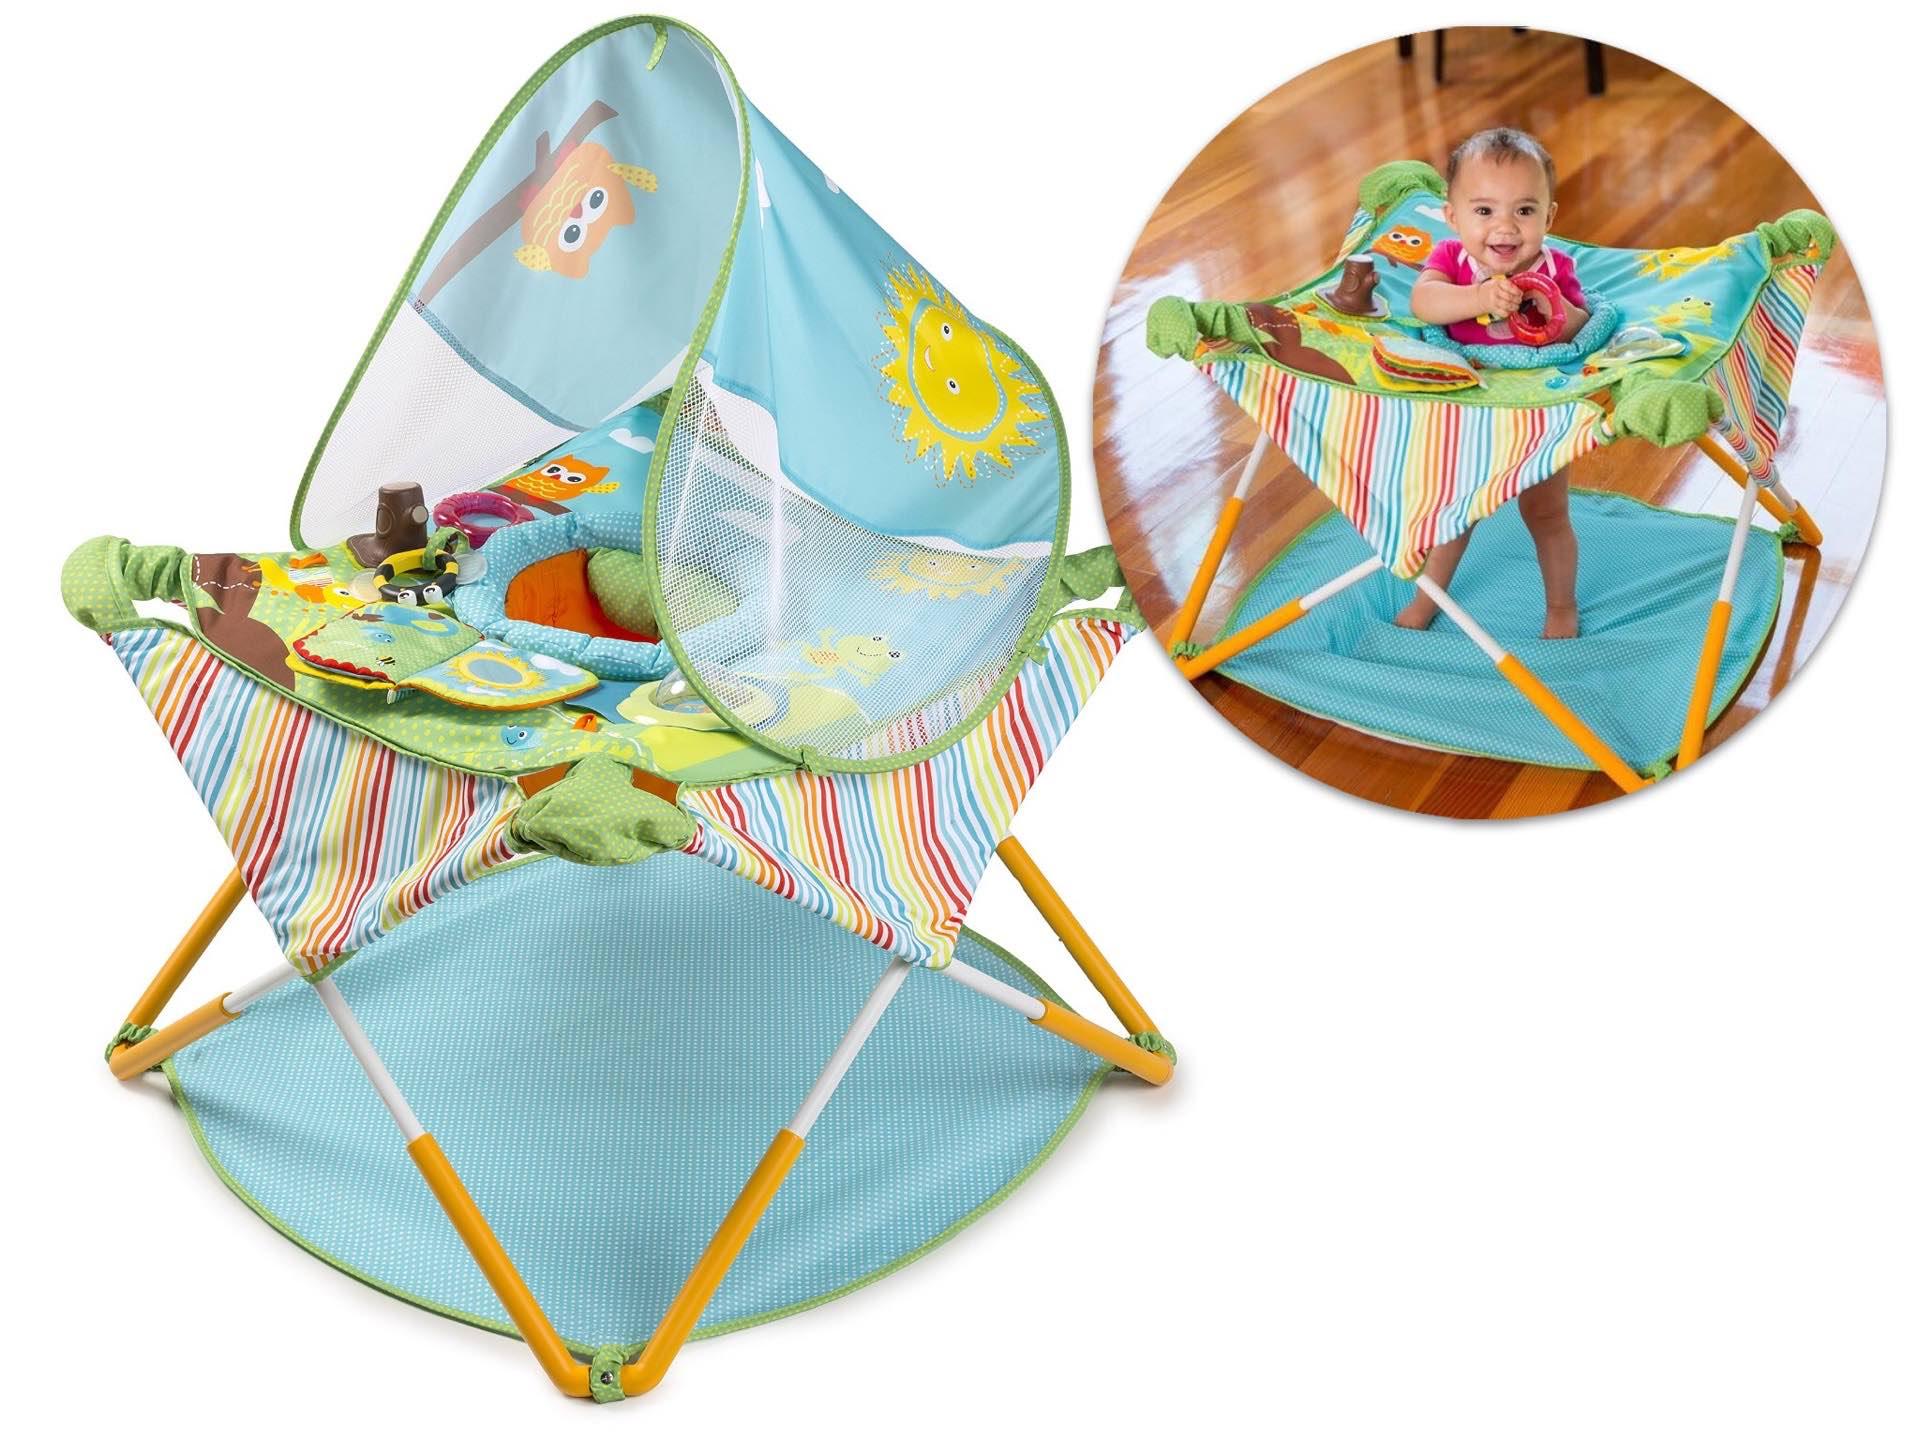 summer-infant-pop-n-jump-portable-outdoor-baby-jumper